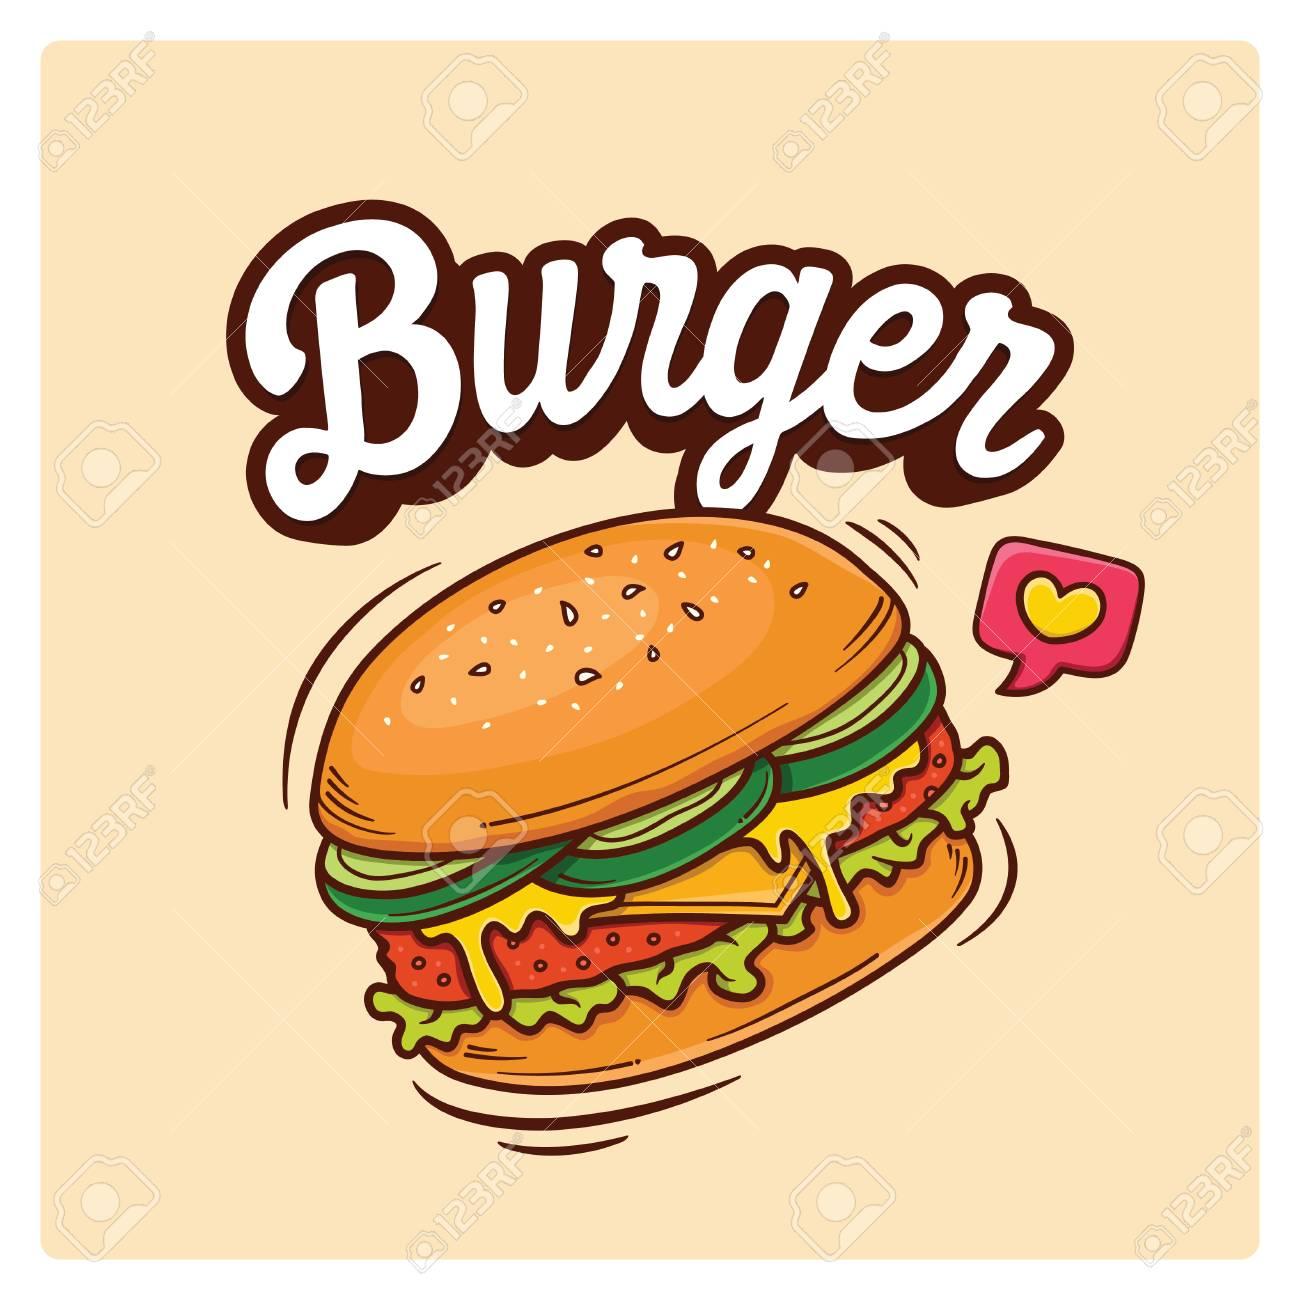 Hand Drawn Big Burger Vector Doodle Illustration - 121093600